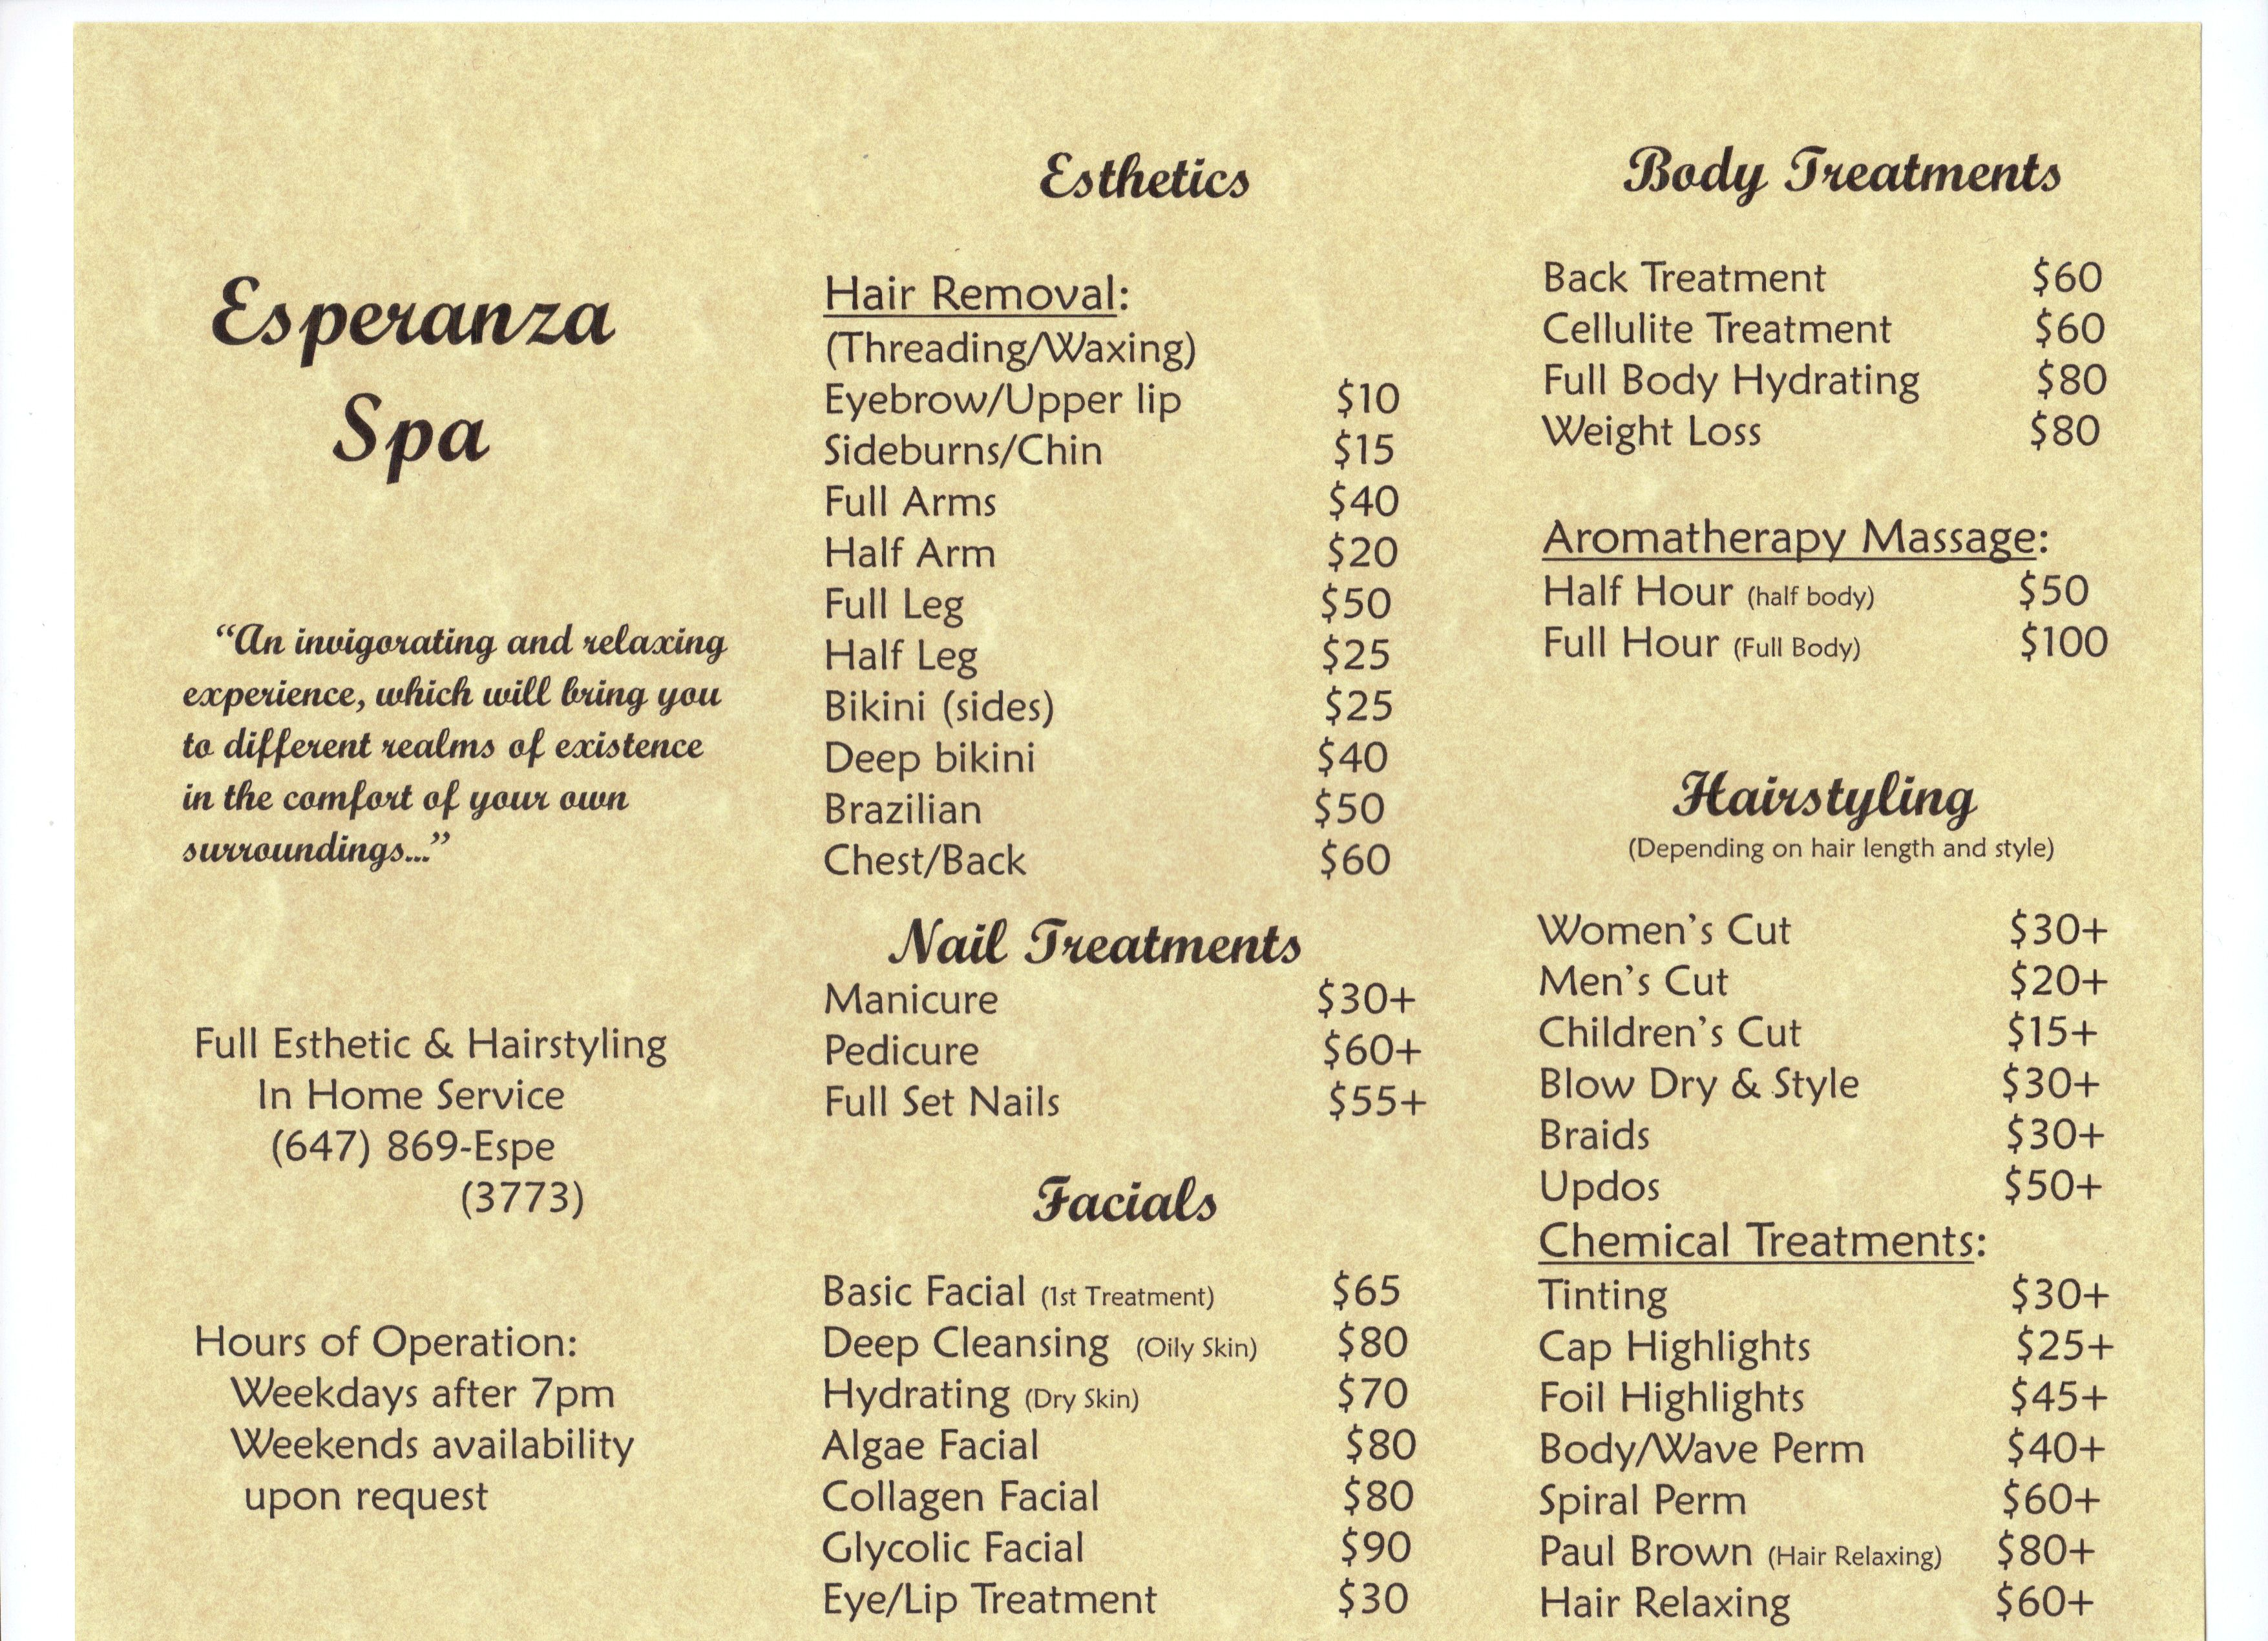 My Mobile Esthetics Business Price List Master